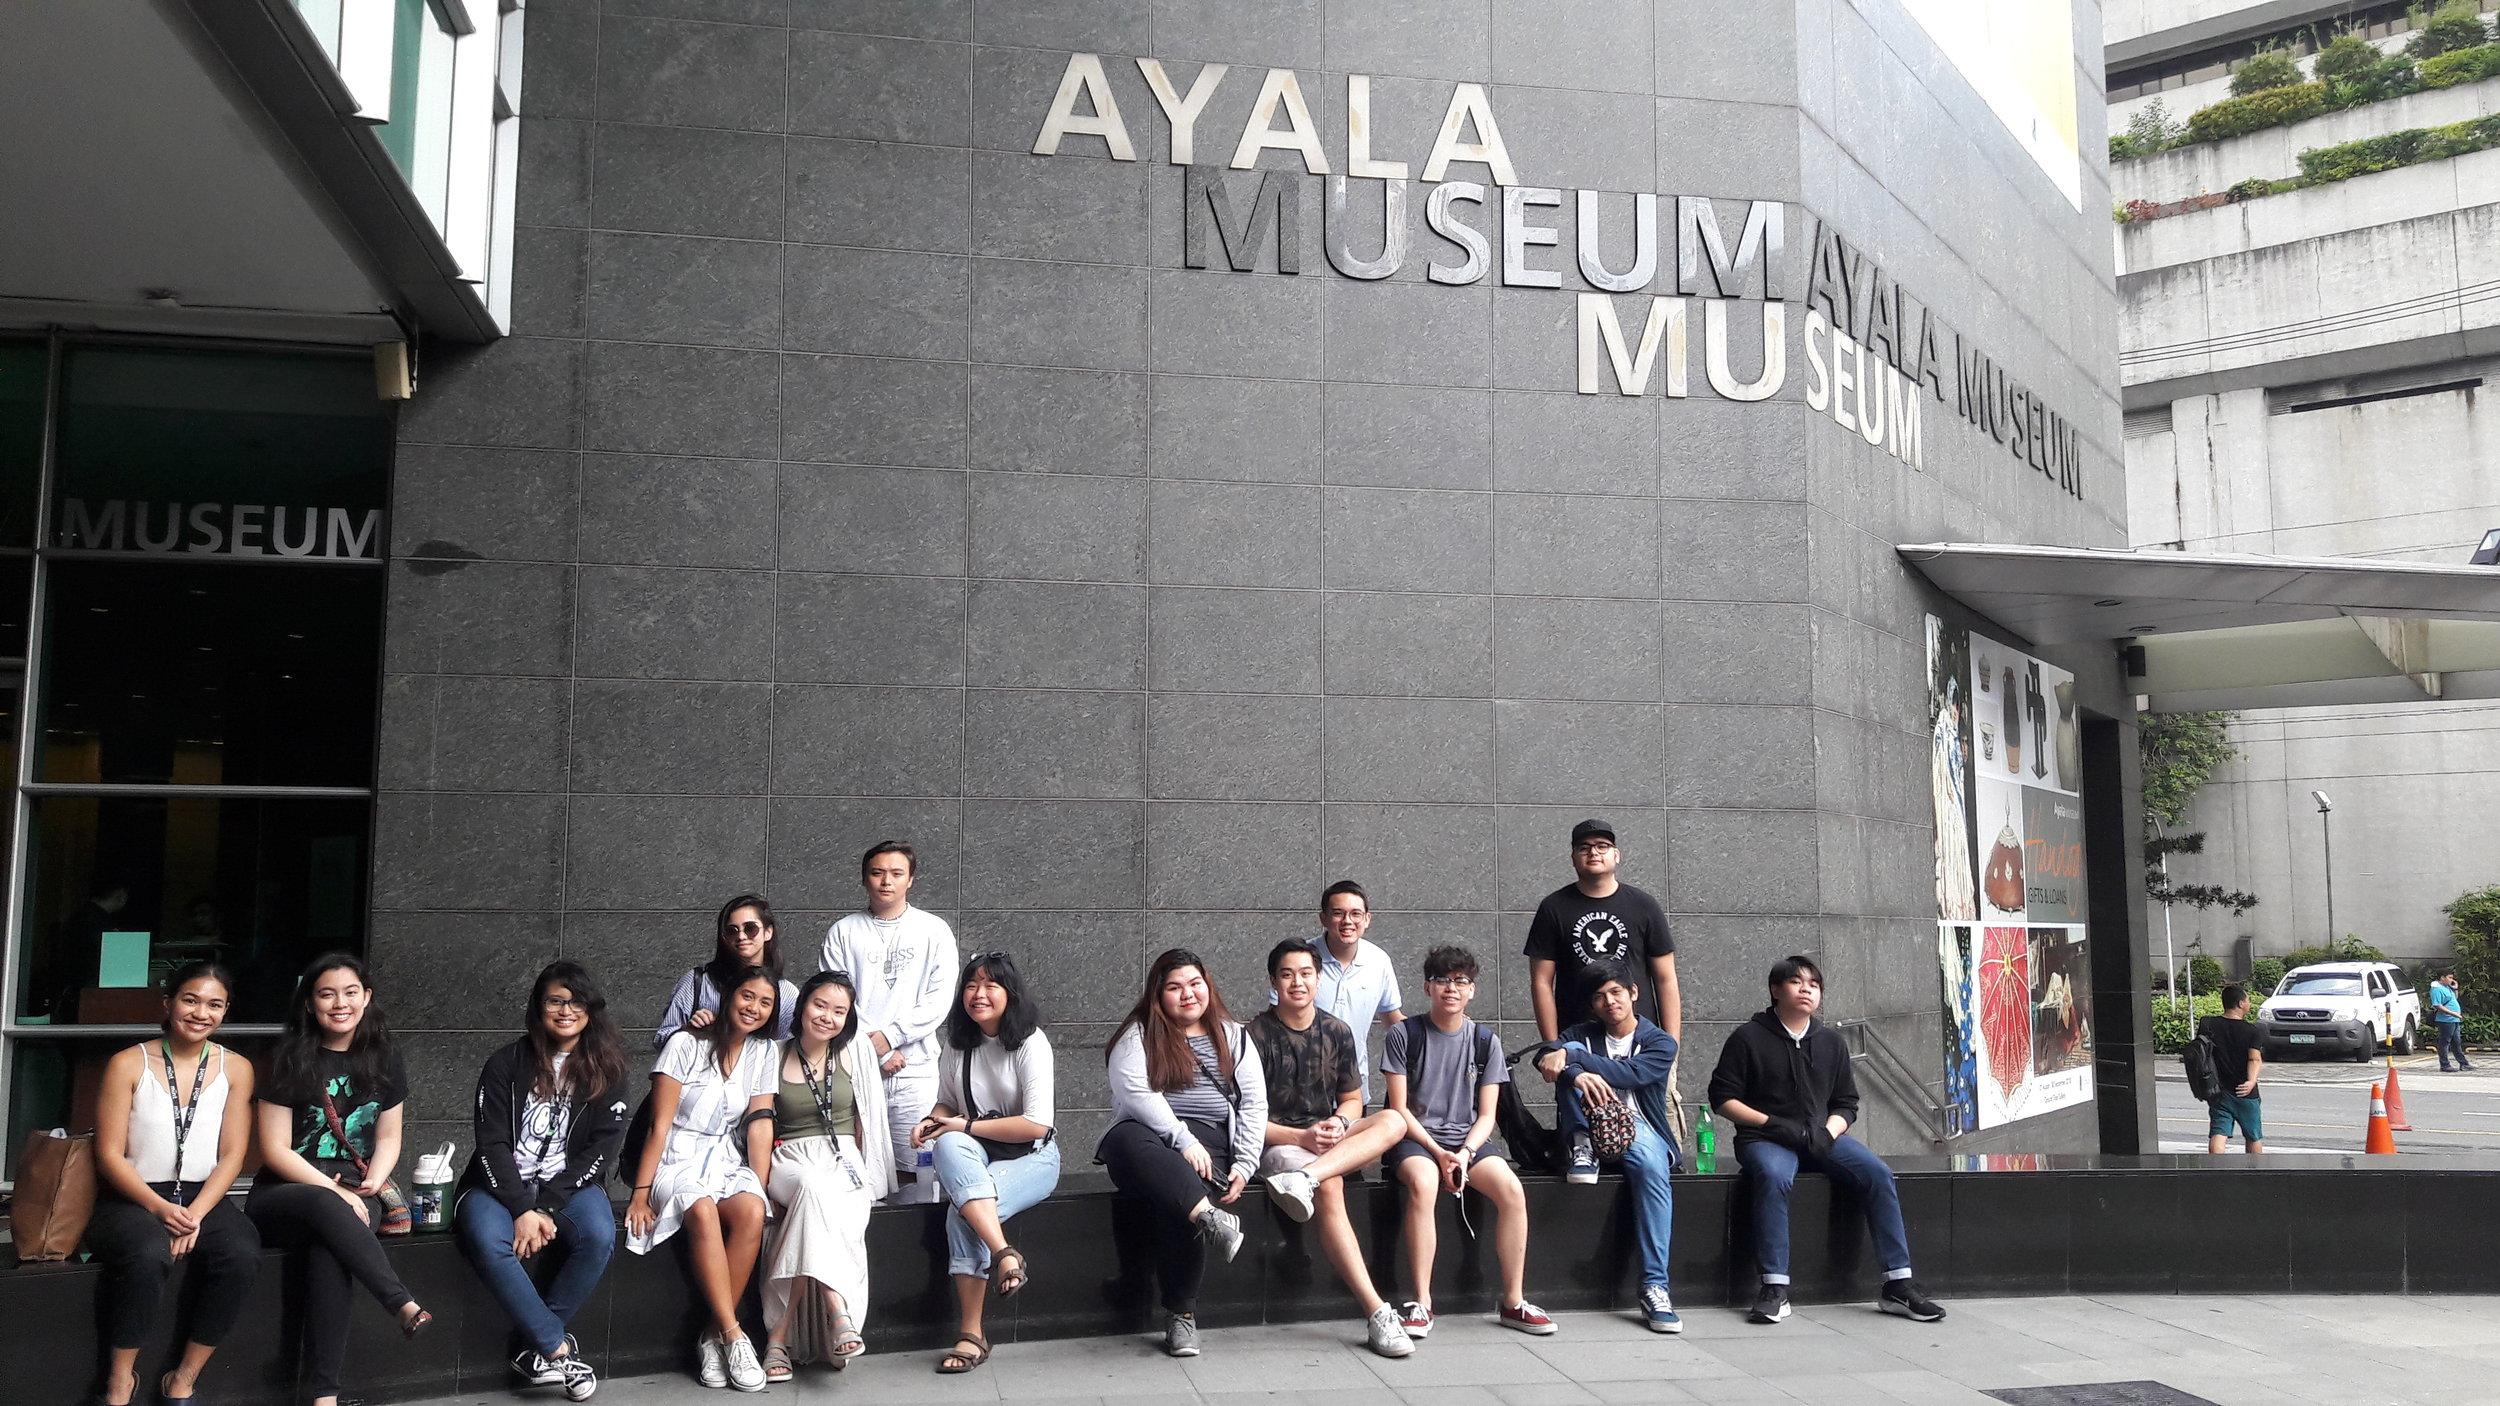 AyalaMuseum1.jpg